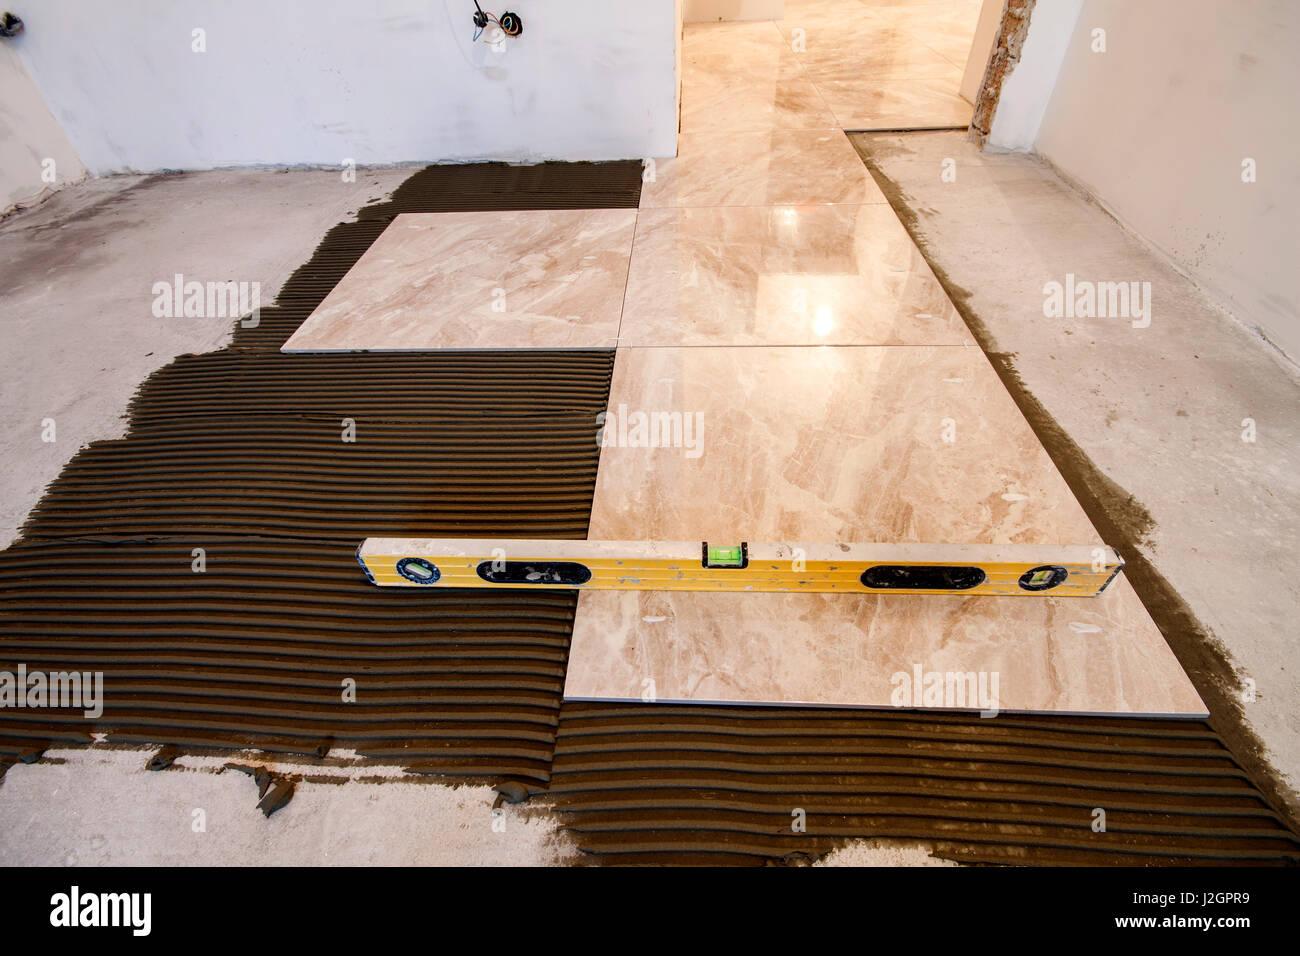 Ceramic tiles and tools for tiler floor tiles installation home ceramic tiles and tools for tiler floor tiles installation home improvement renovation ceramic tile floor adhesive mortar level doublecrazyfo Gallery